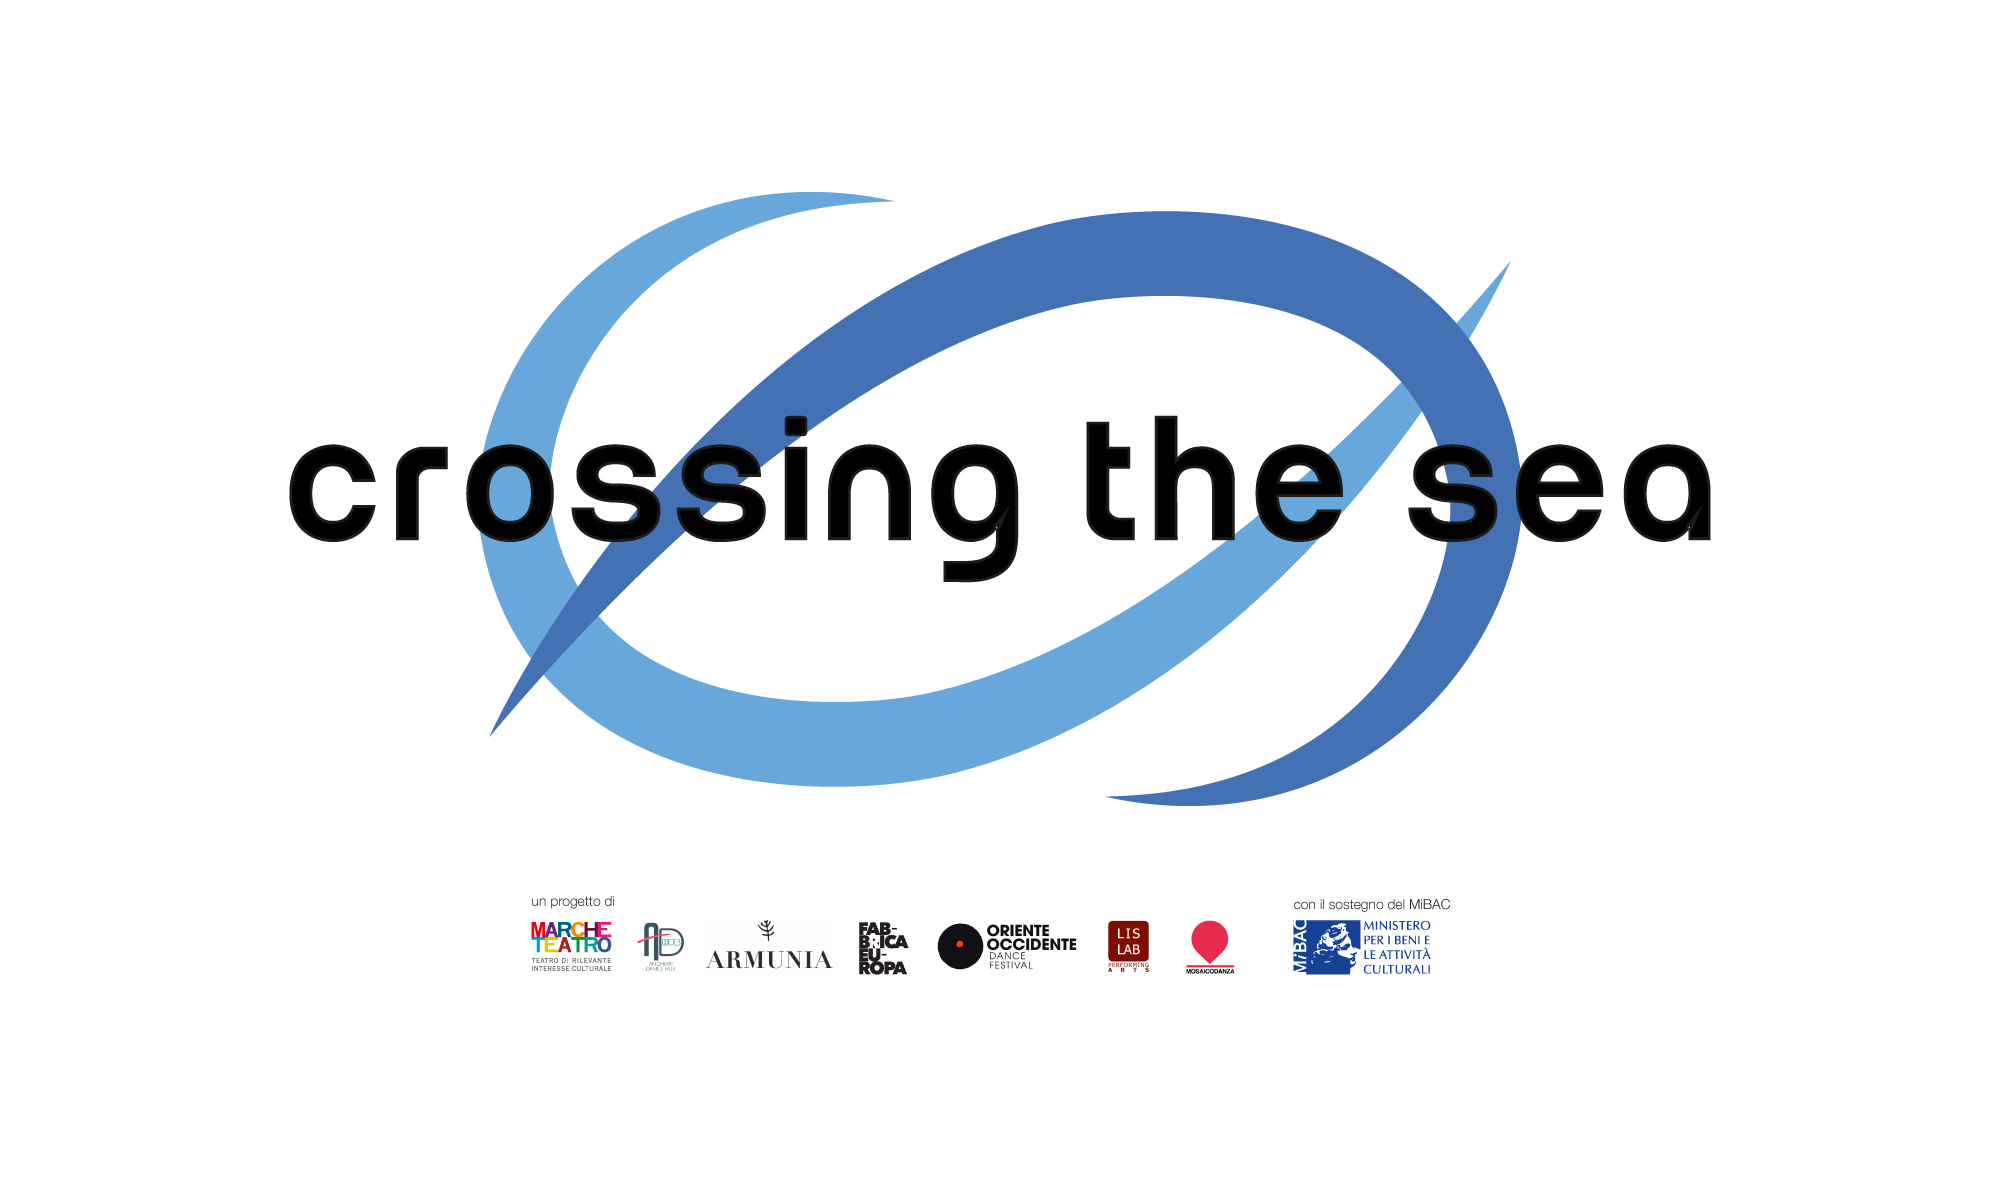 CROSSING THE SEA